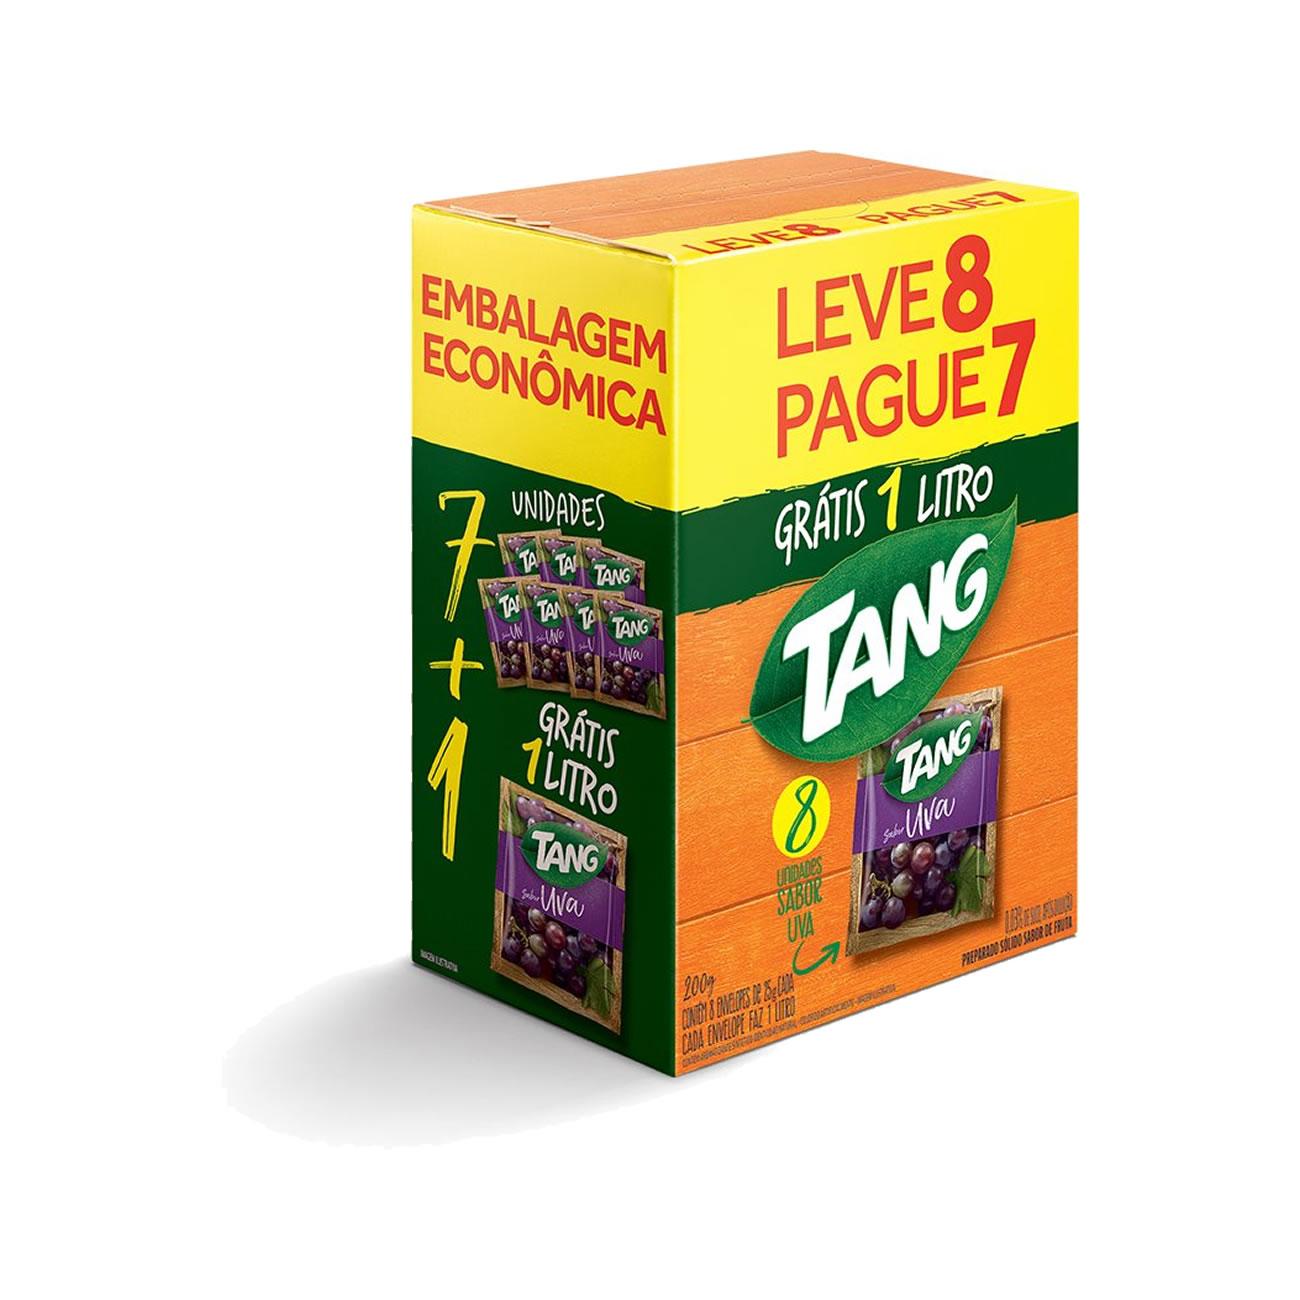 Refresco Tang Uva Pack Promocional 25 g